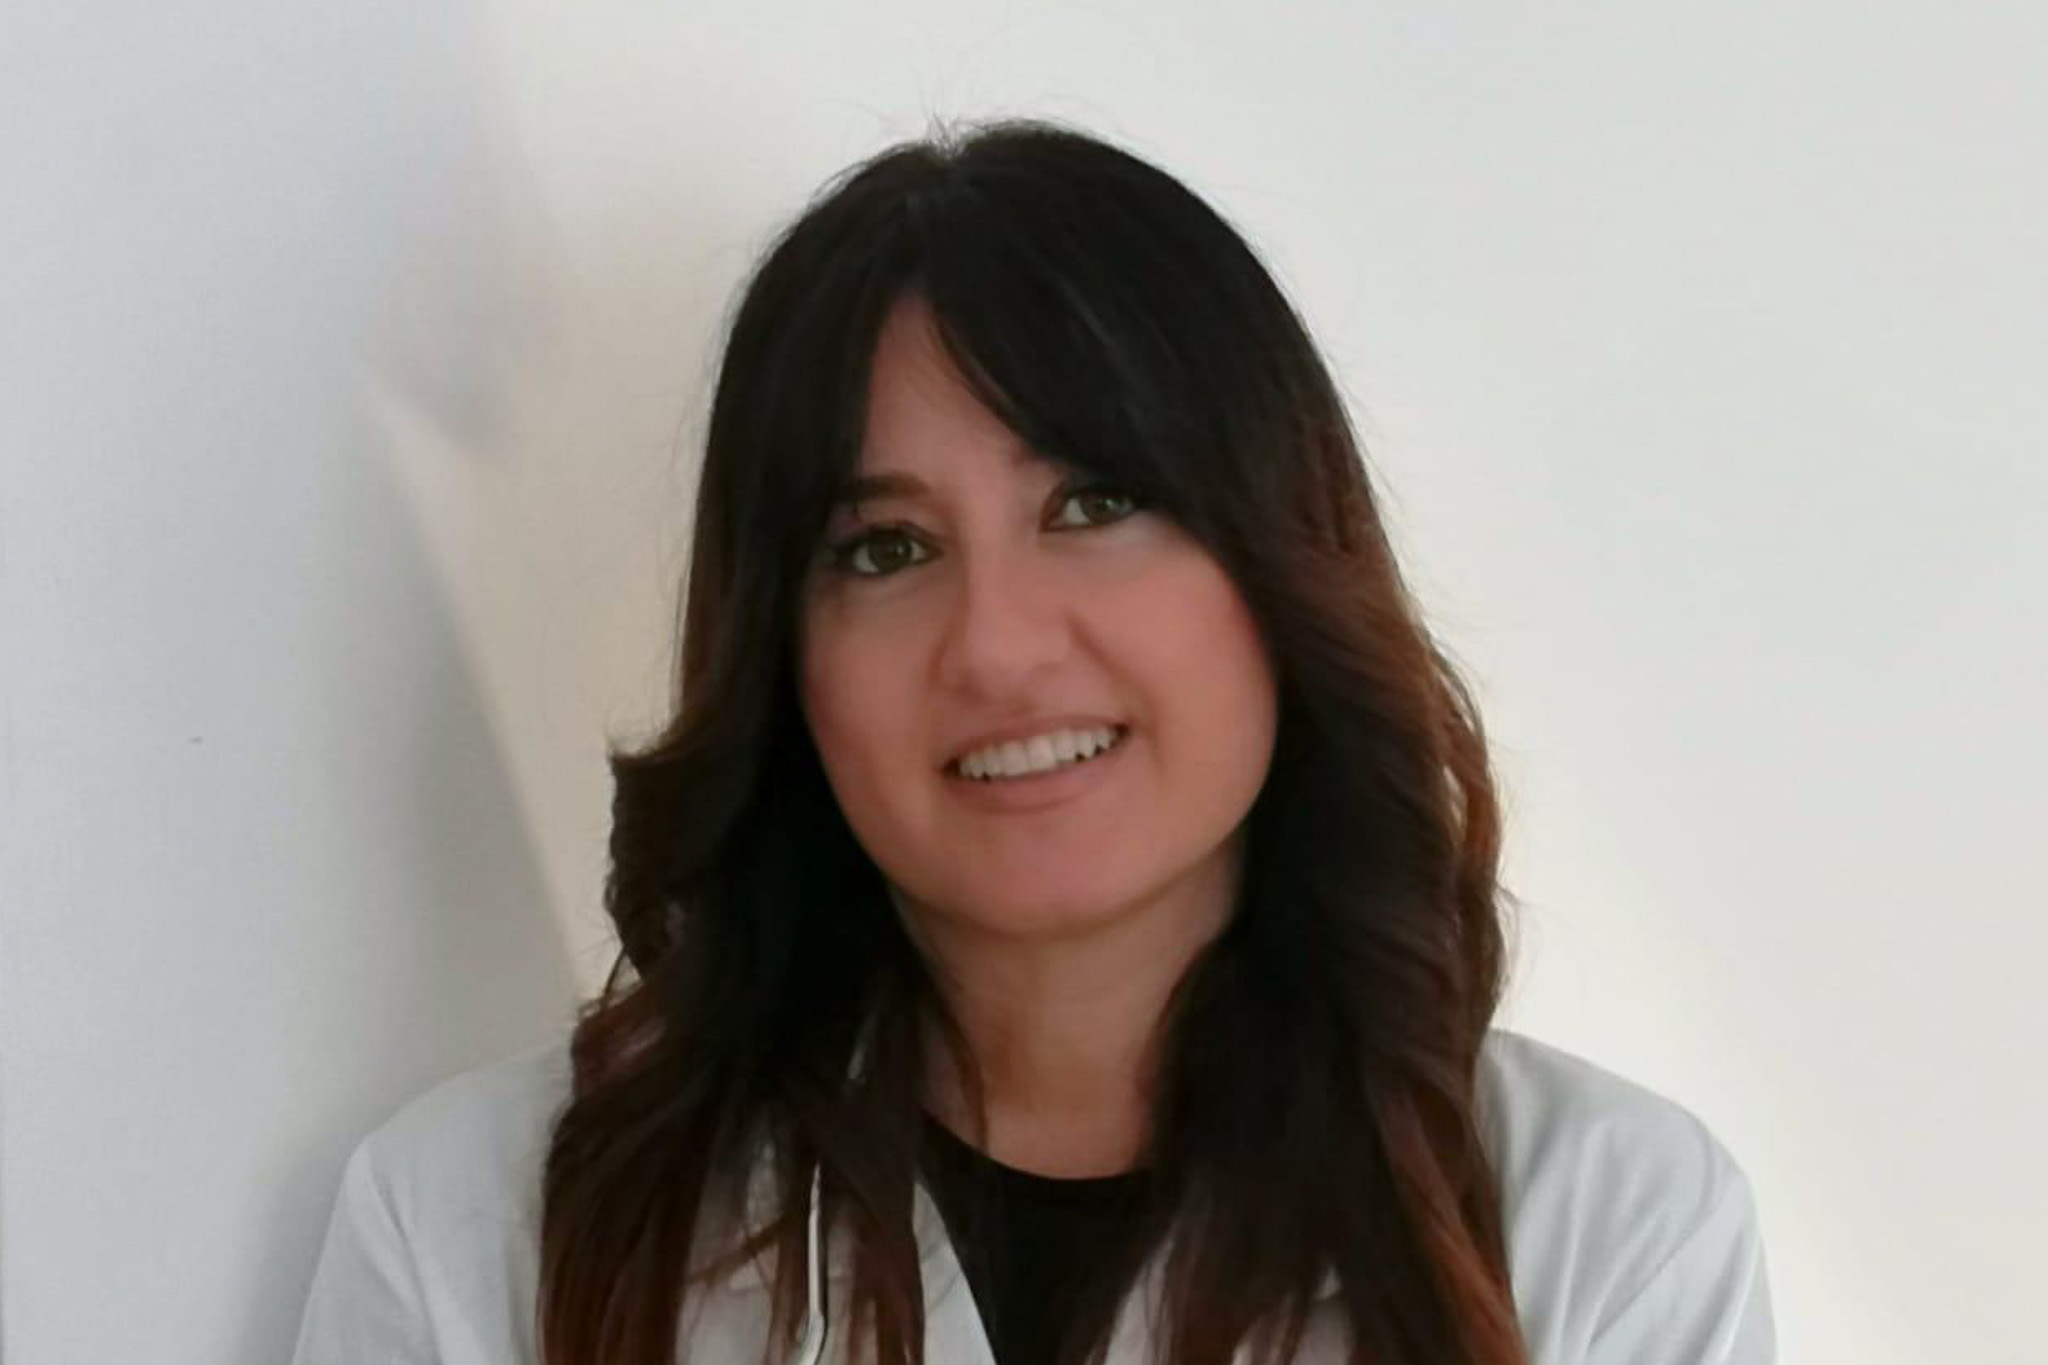 Dott.ssa_Maria_Francesca_Castagnino_Polimedica_Favino